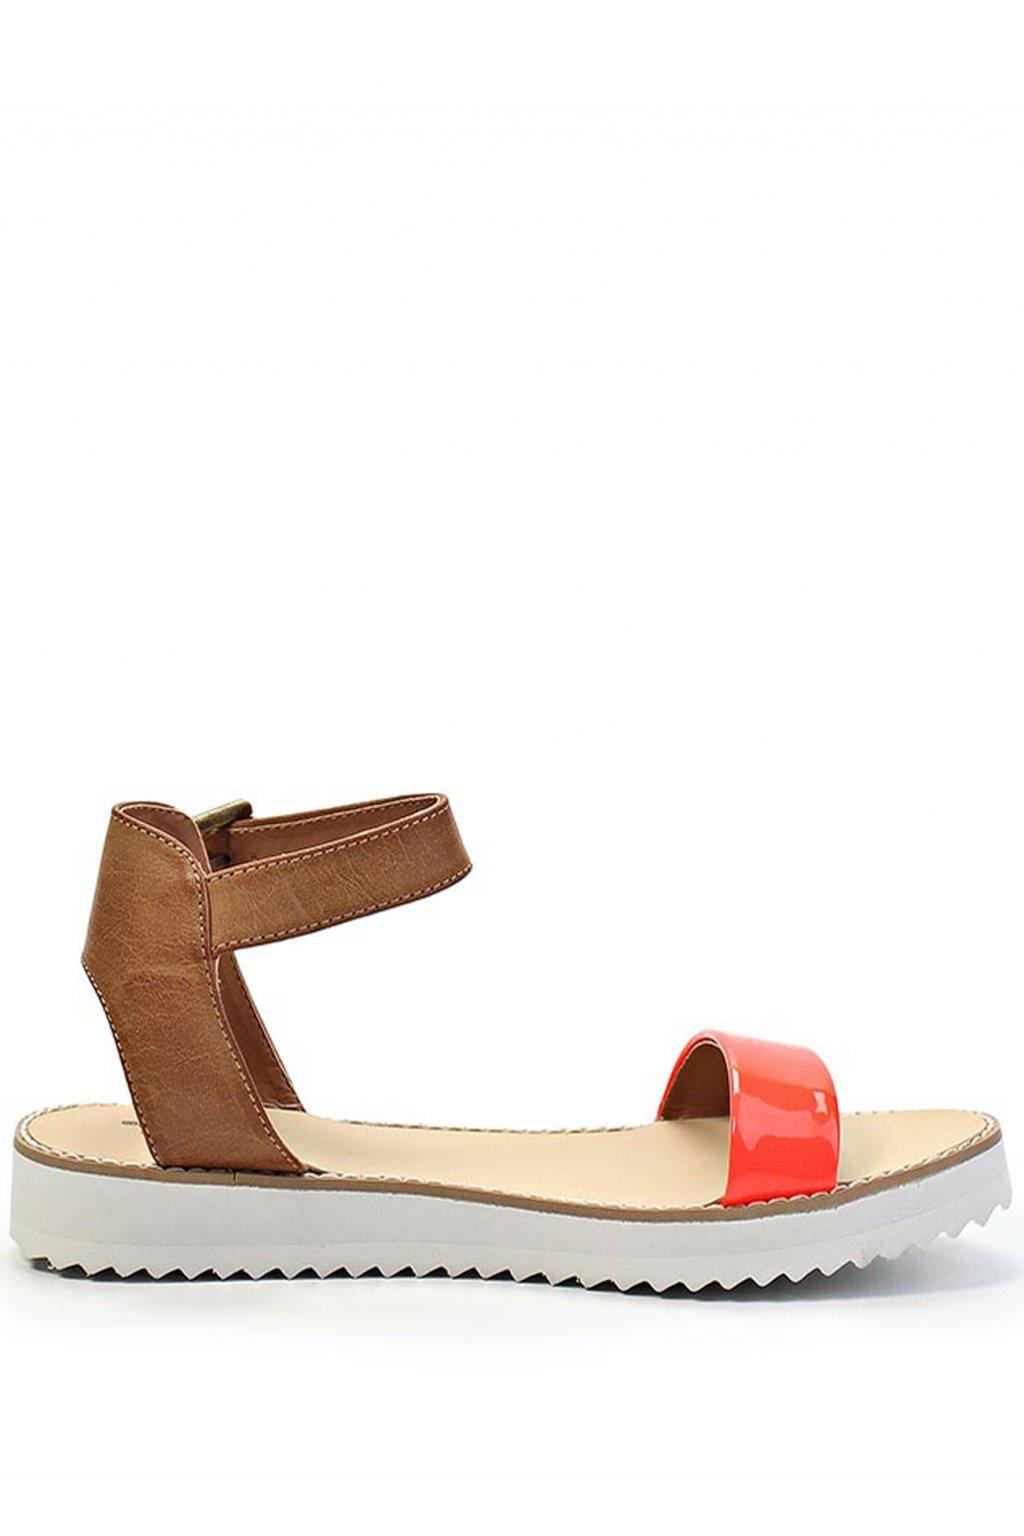 086cae1fa2 Páskové oranžové sandály na platformě Timeless Quing - DesignShoes.cz